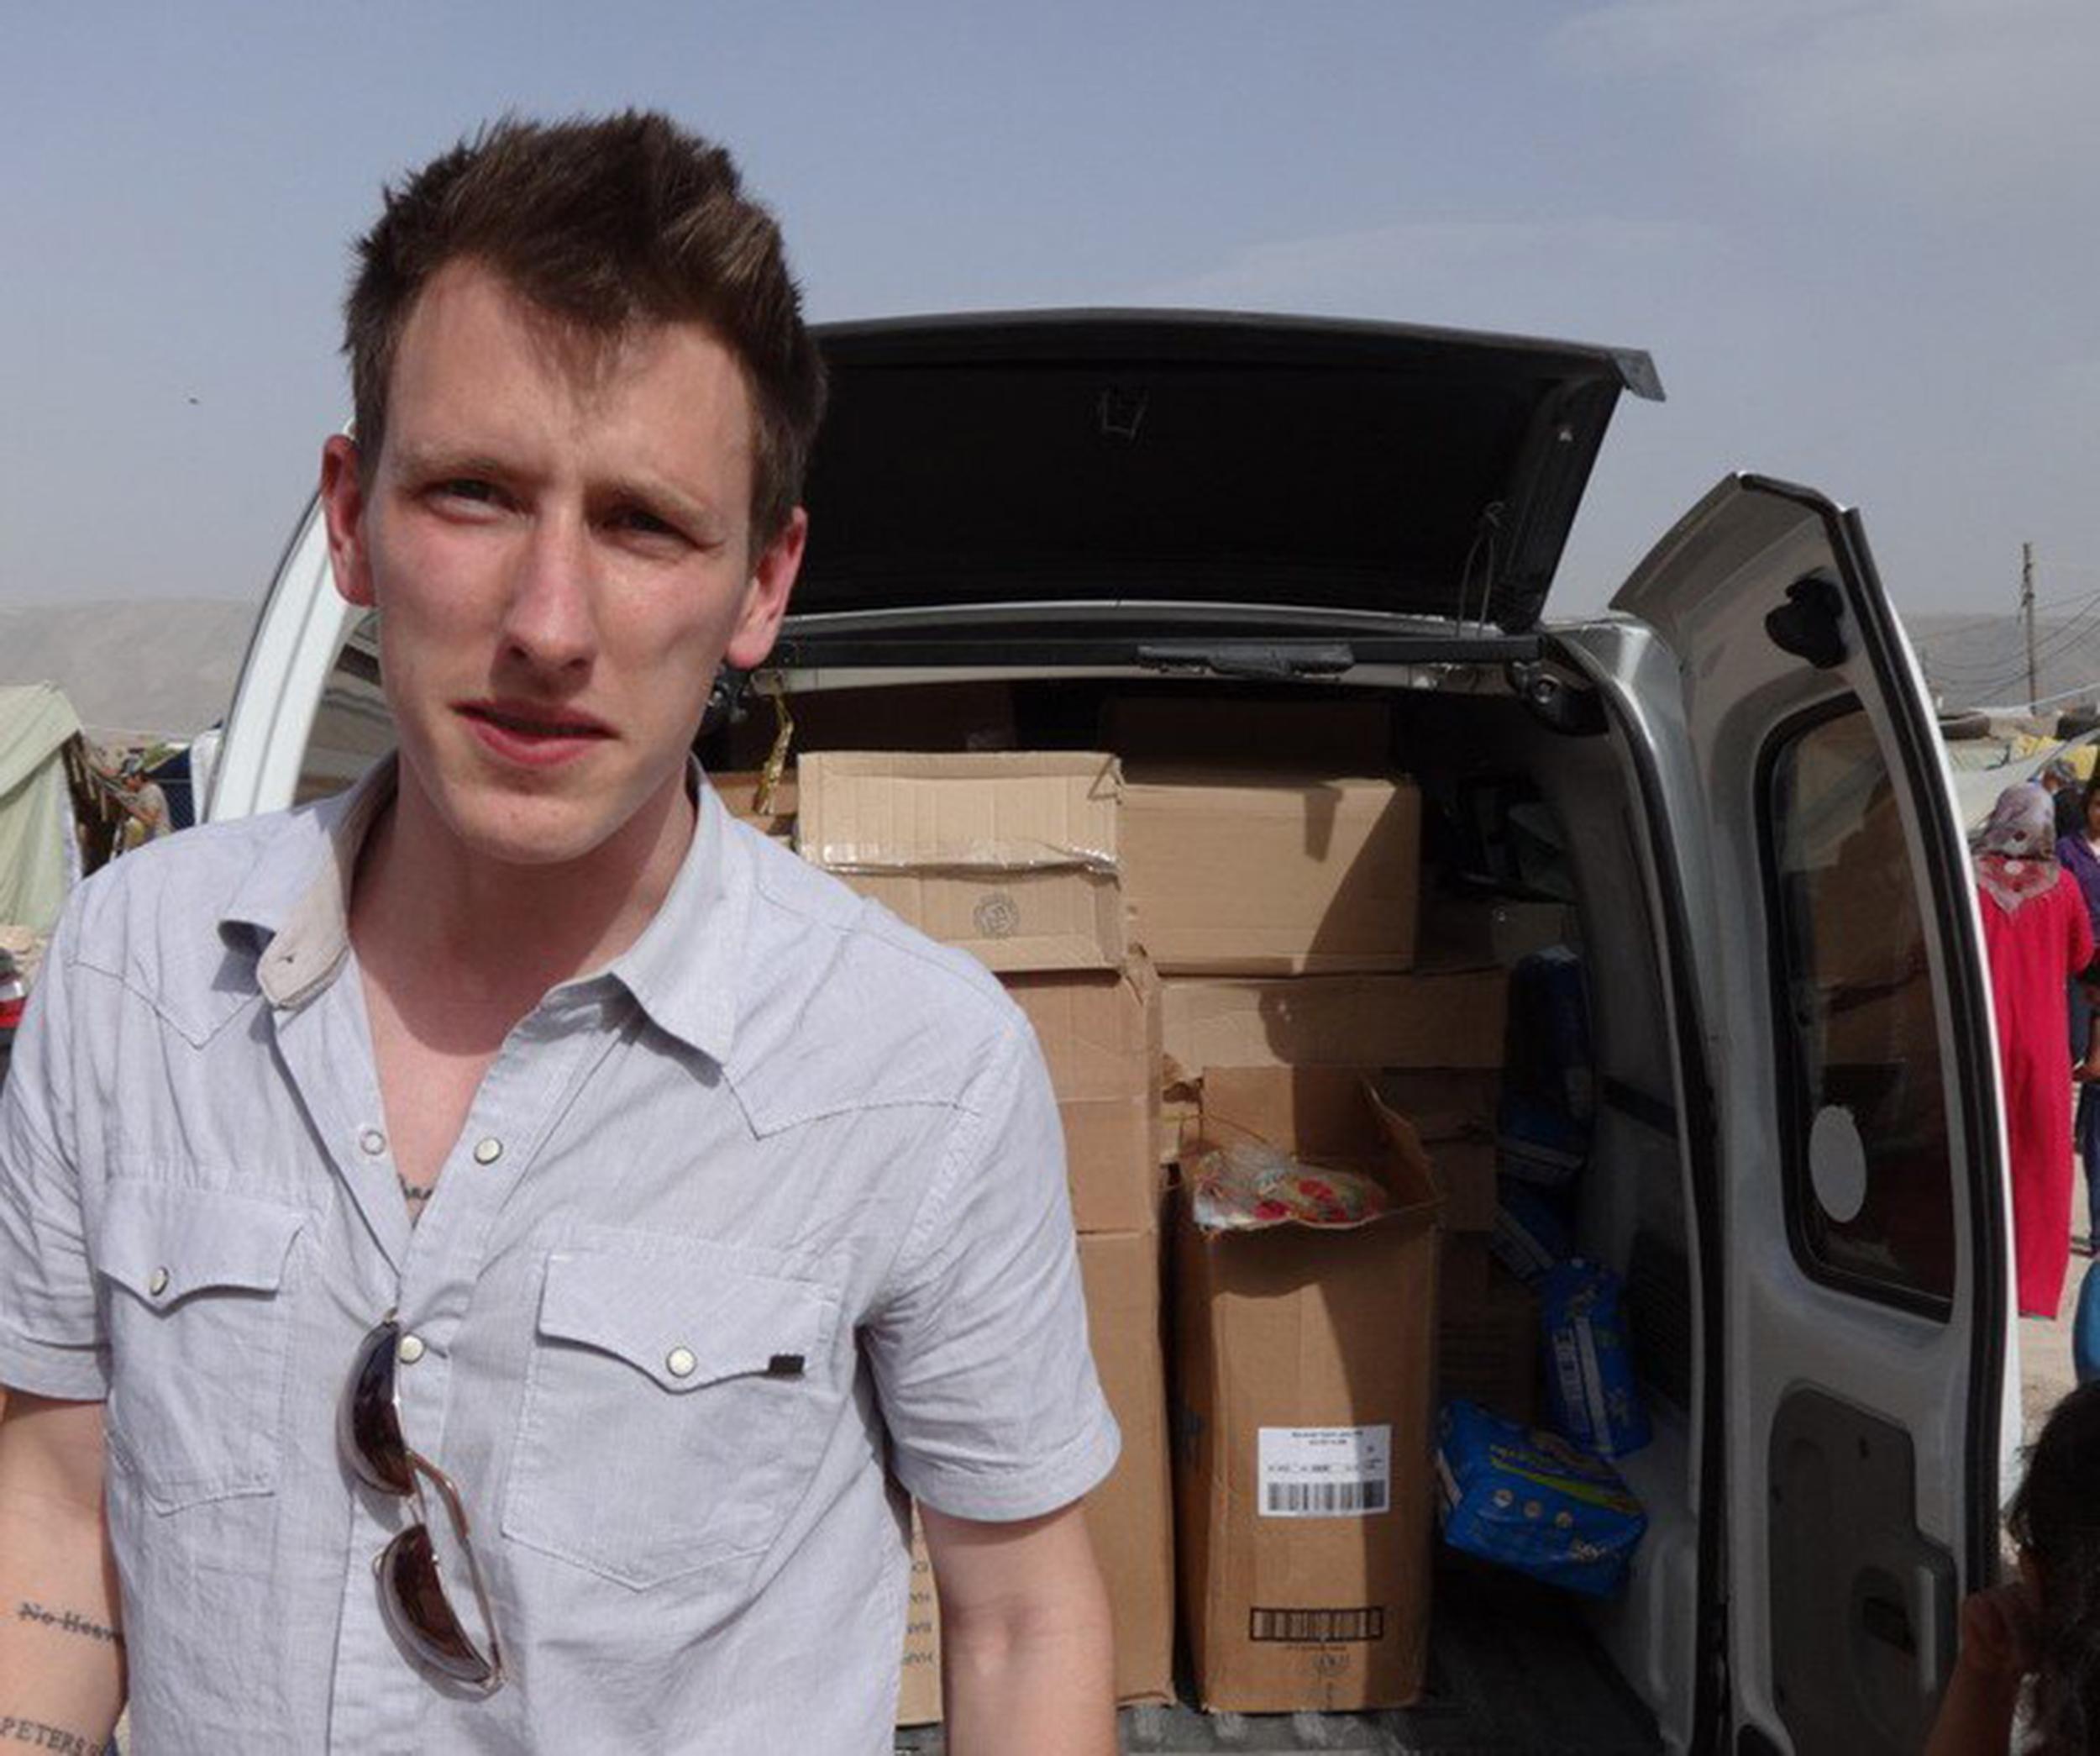 Airstrike kills ISIS leader responsible for death of American aid worker Peter Kassig